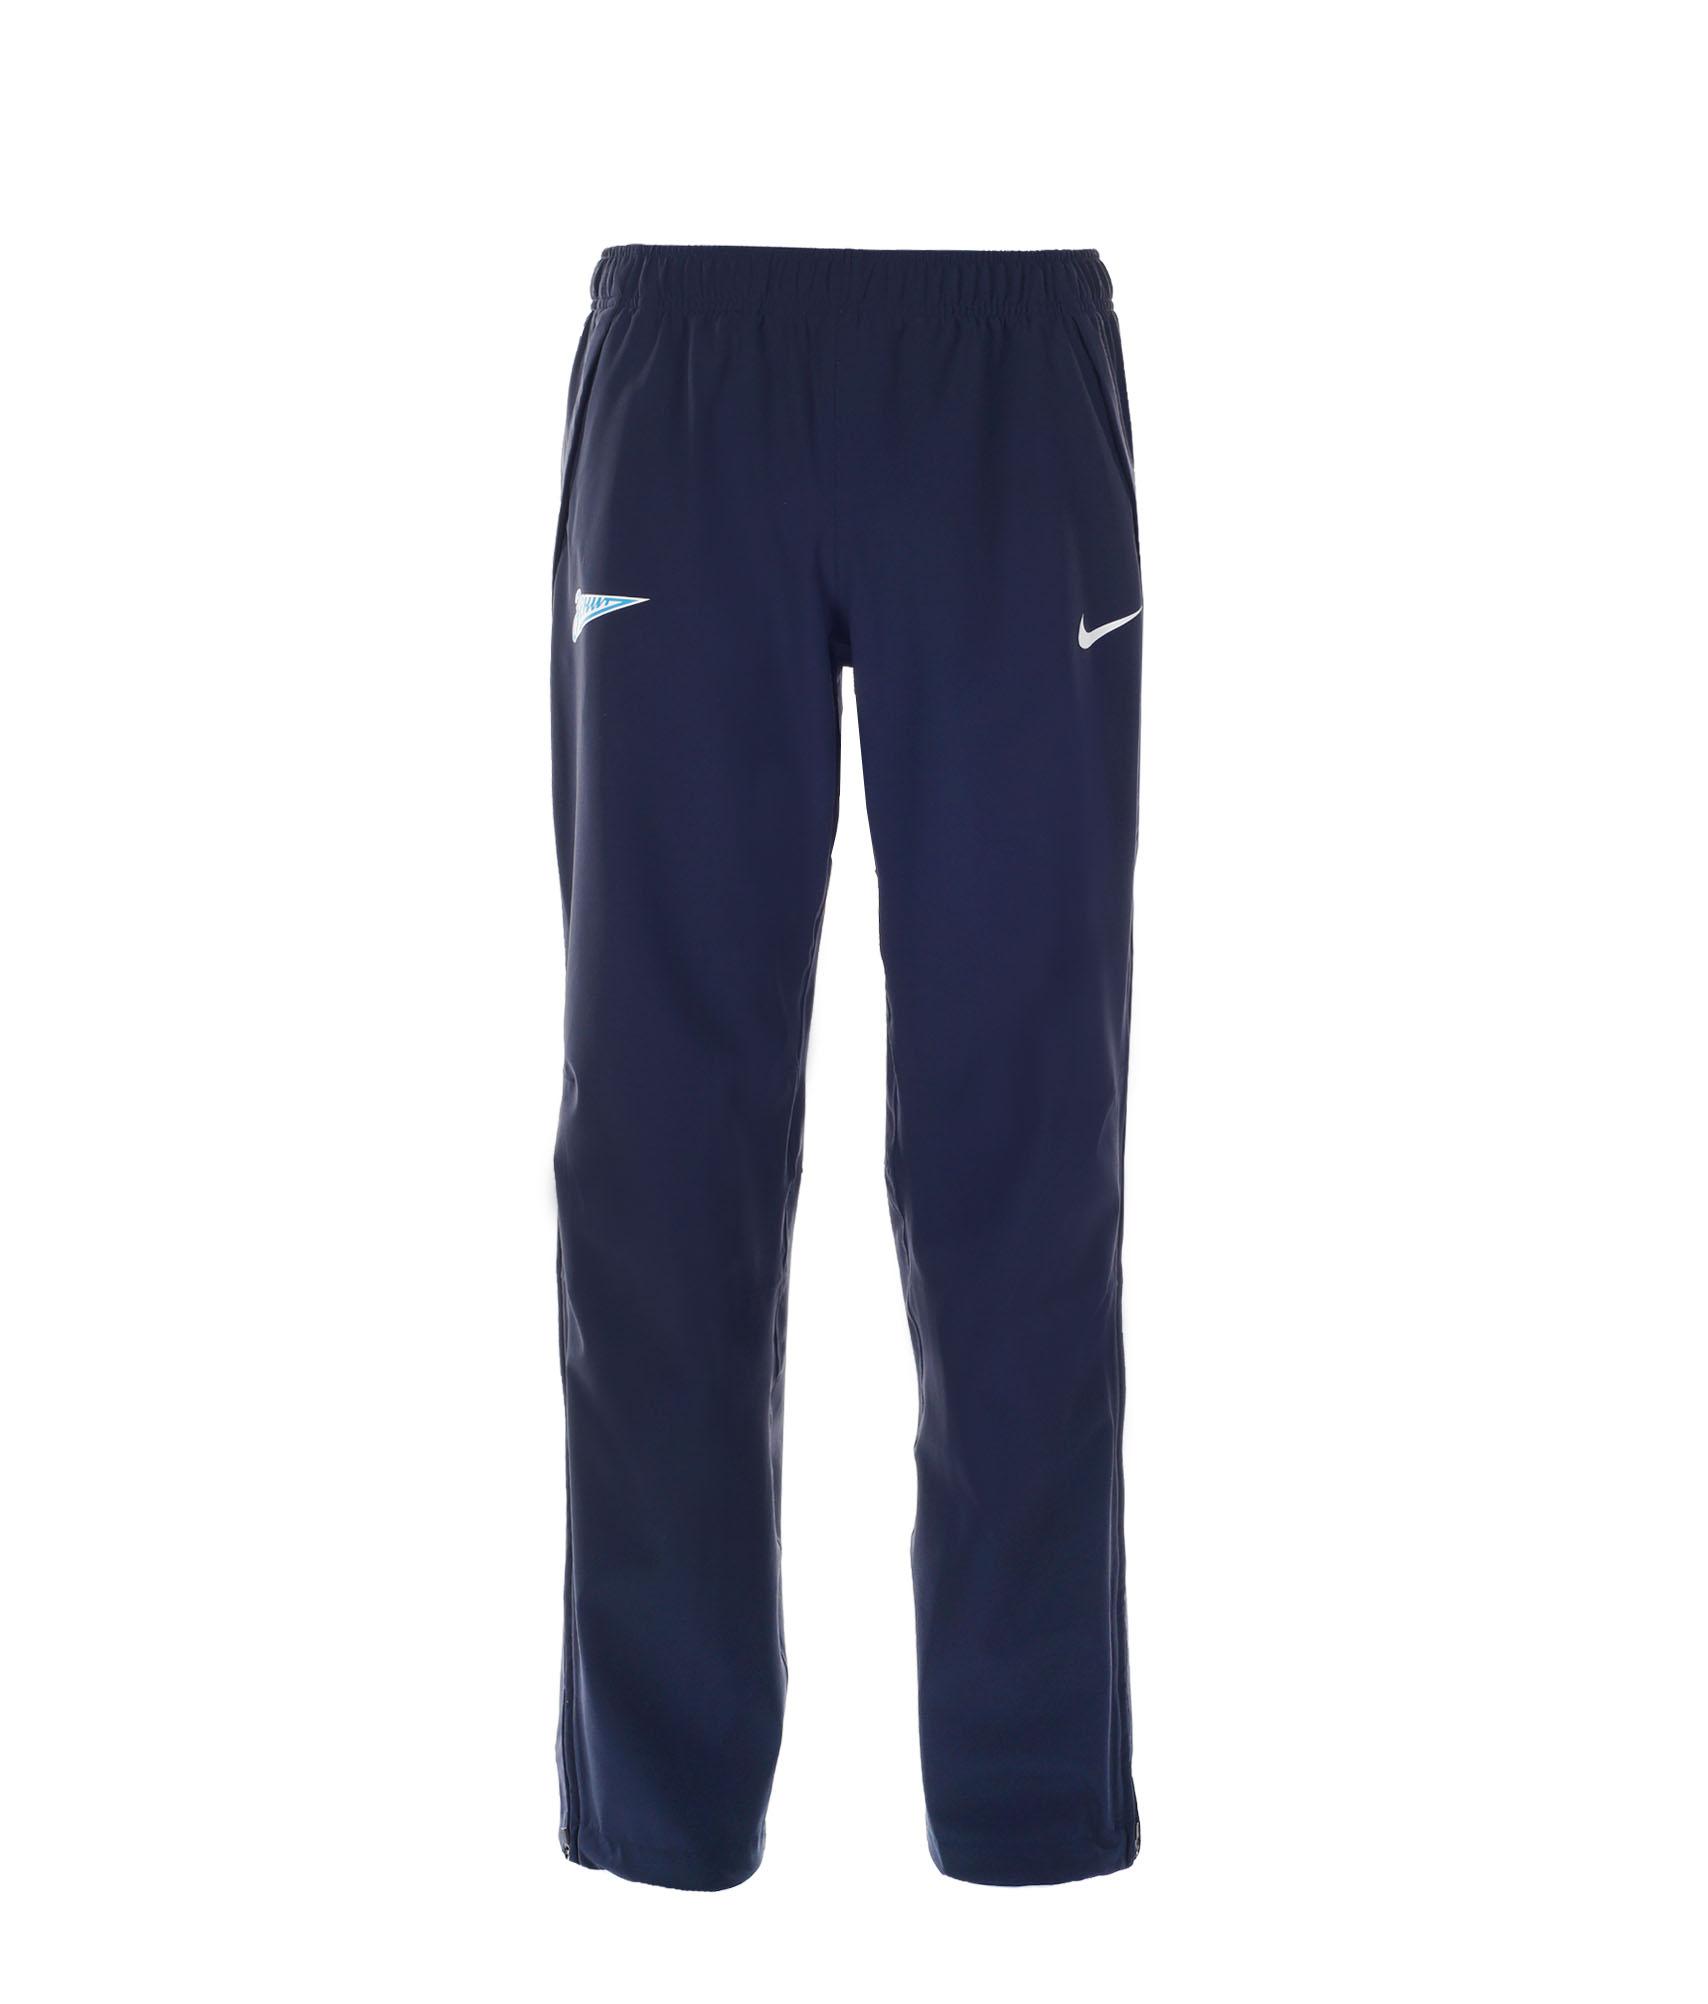 Брюки Nike Zenit Select Pro Rain Pant, Цвет-Синий, Размер-XS